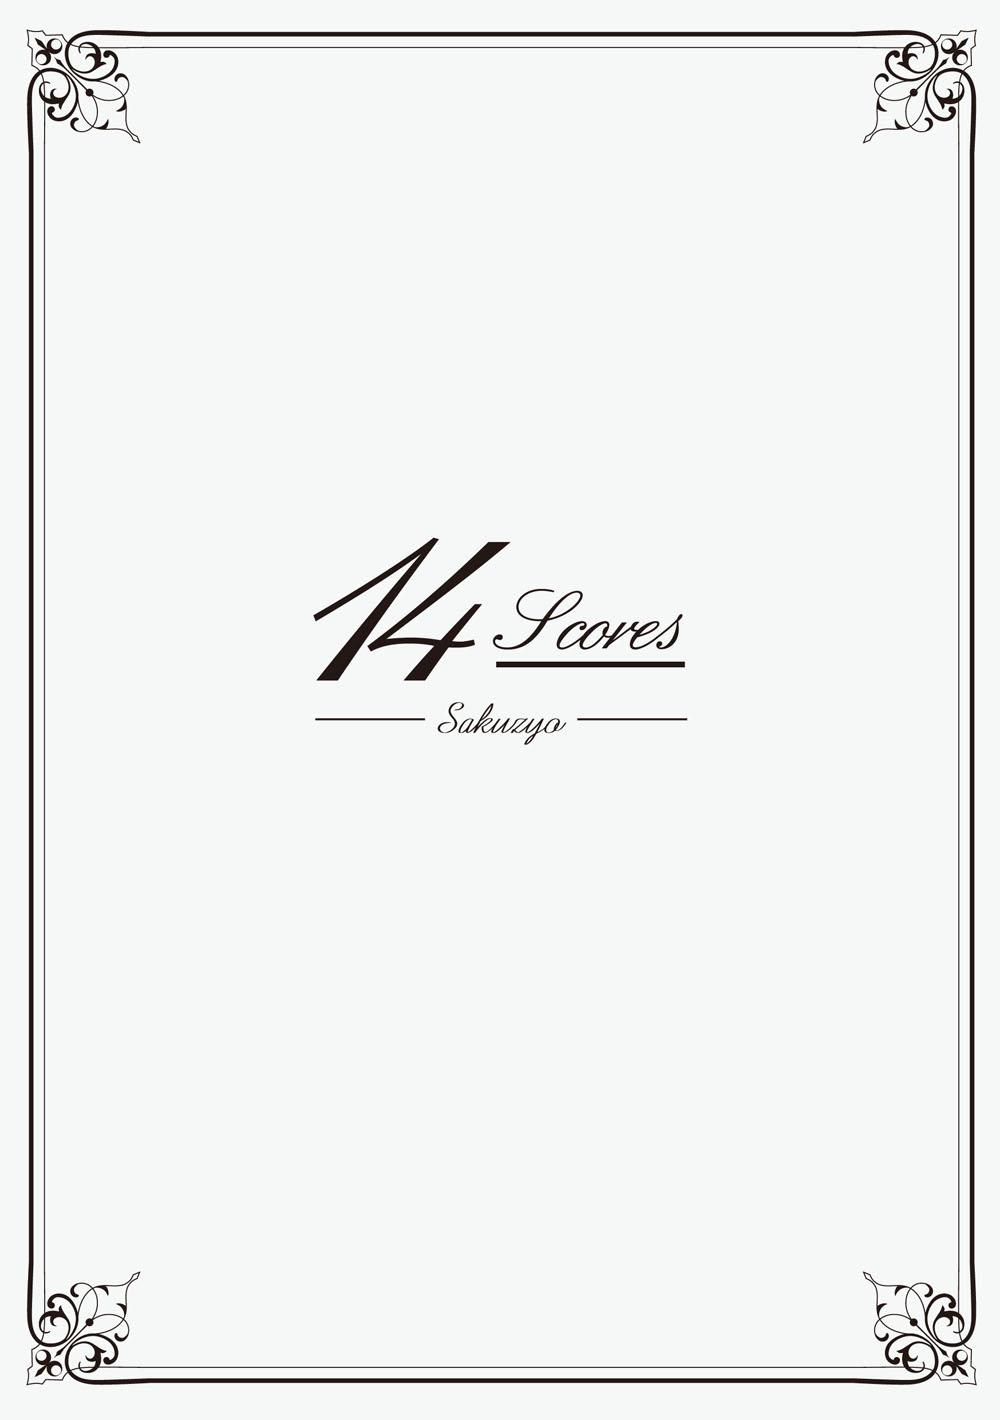 14 Scores 楽譜冊子